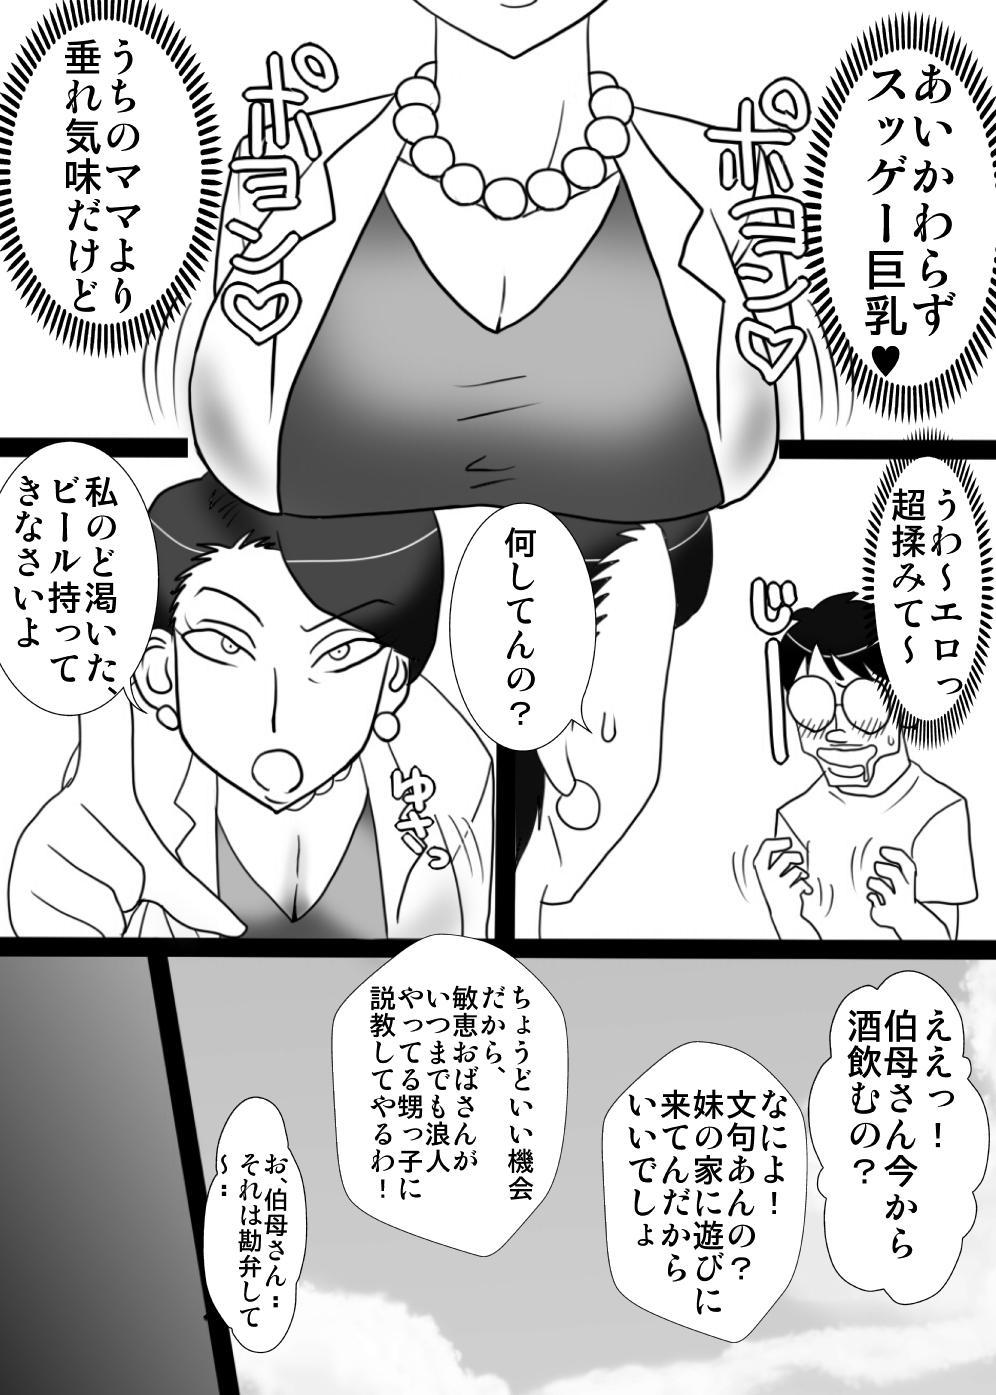 Oba-san o Otosuze! 3